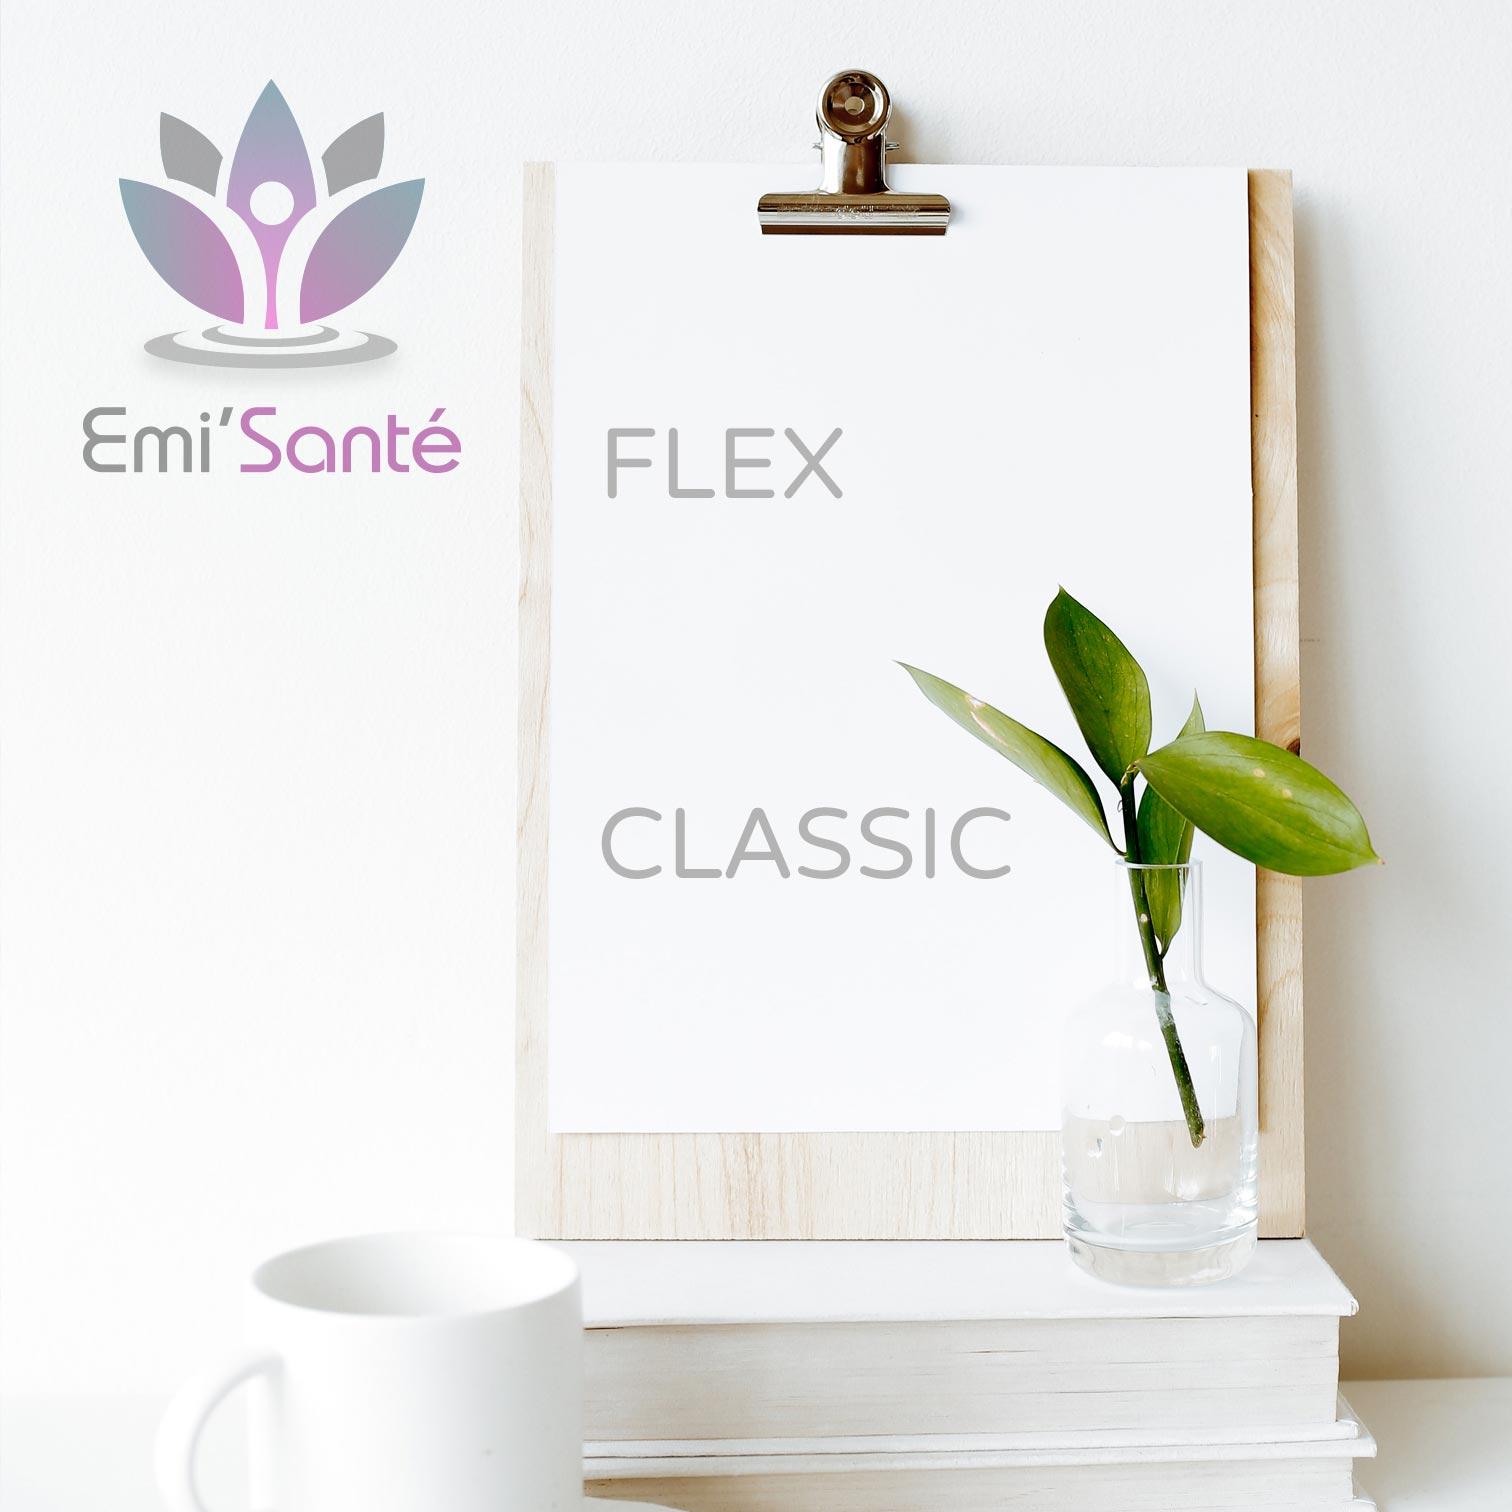 emisante.be Flex Classic Ann Nekr Pexels